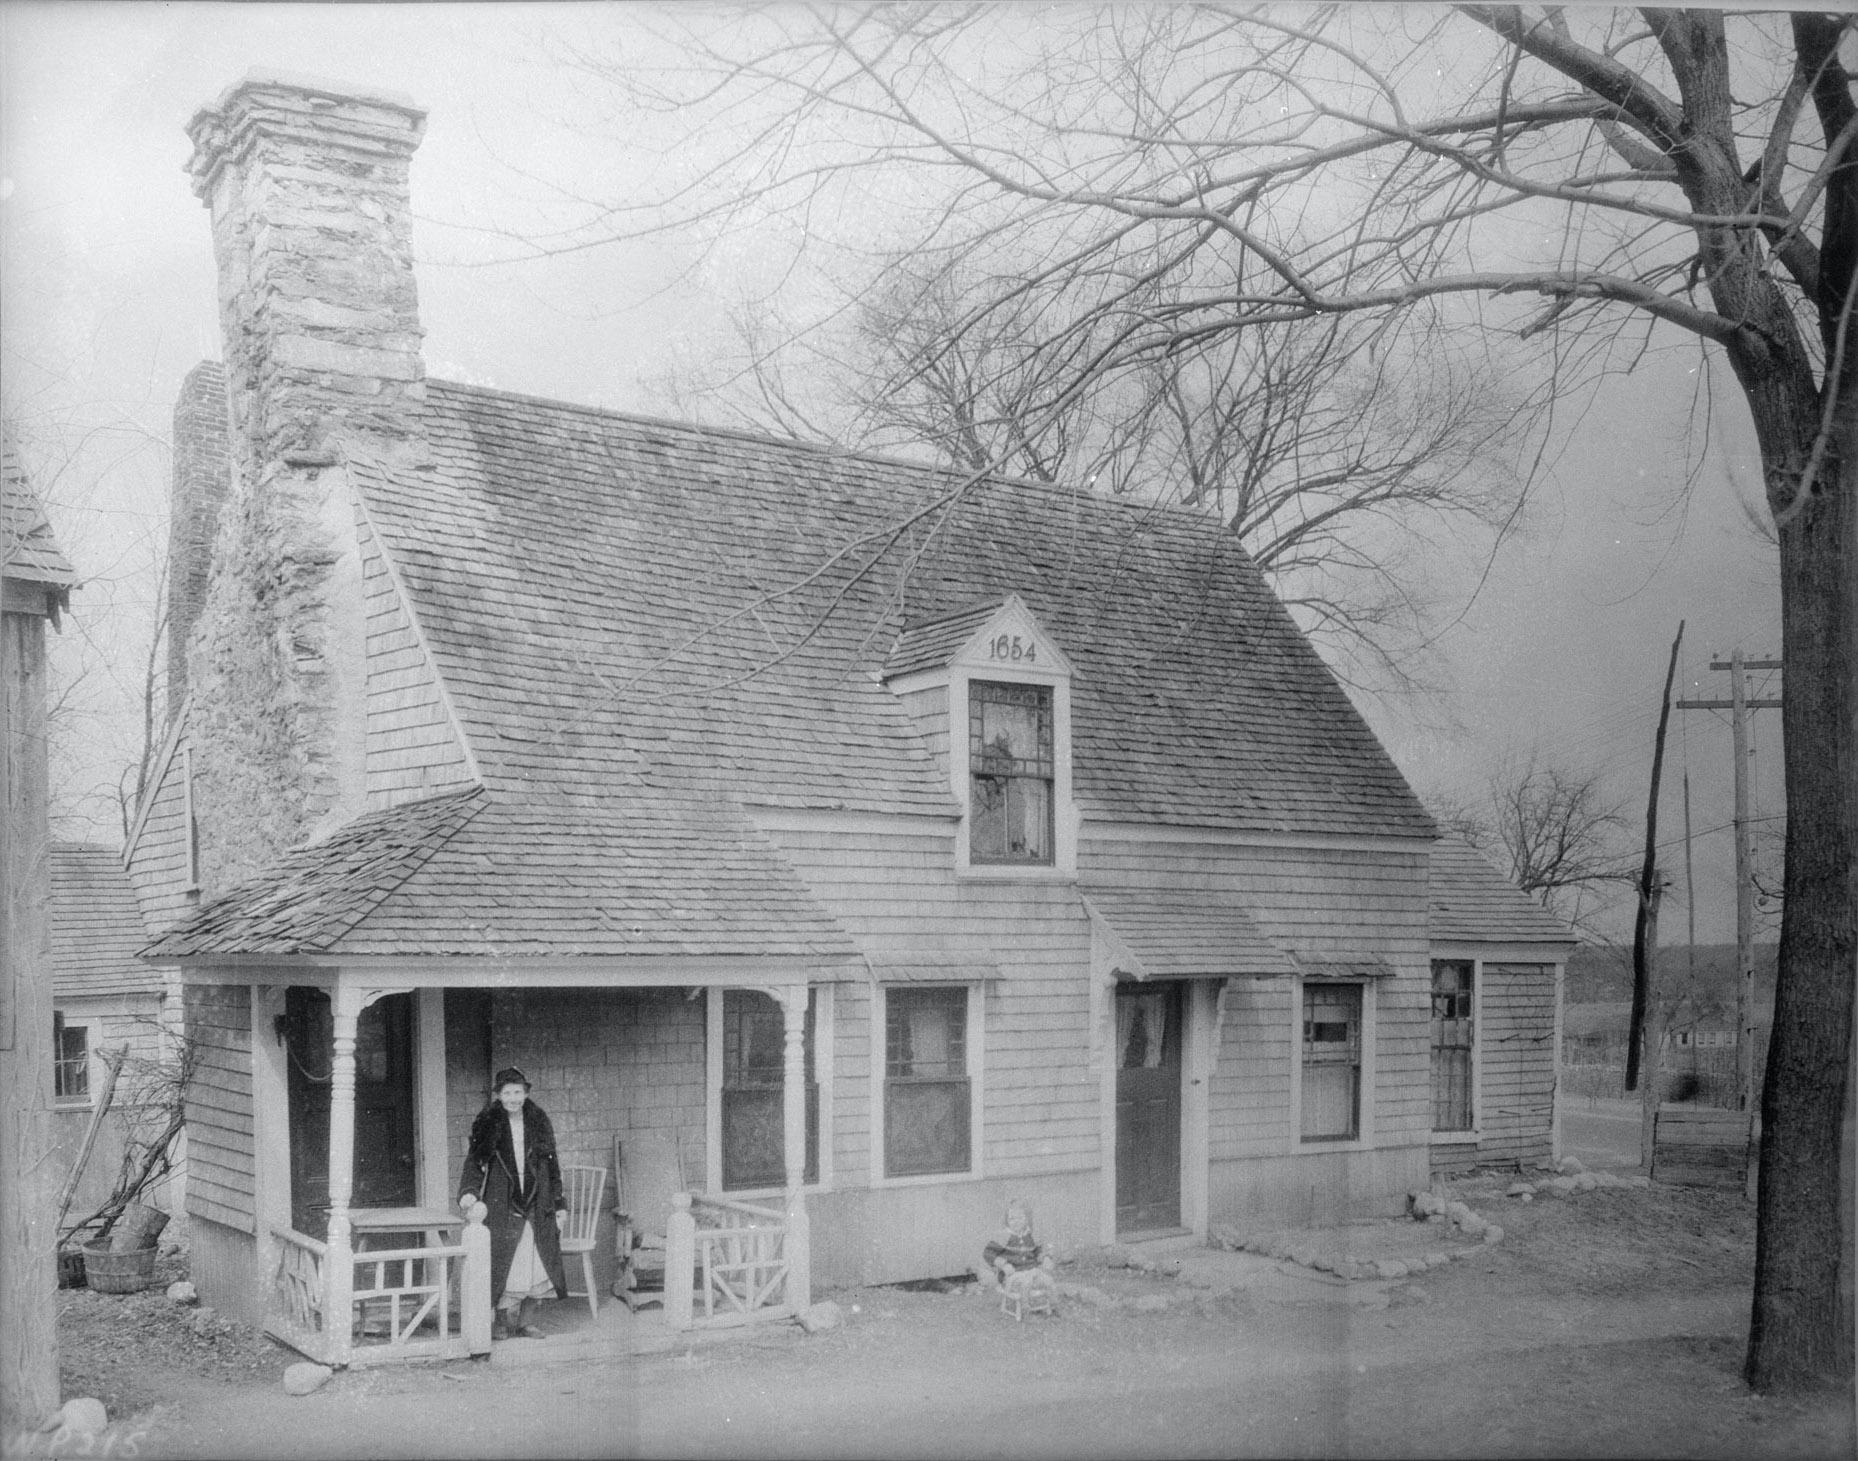 home restored in 1941